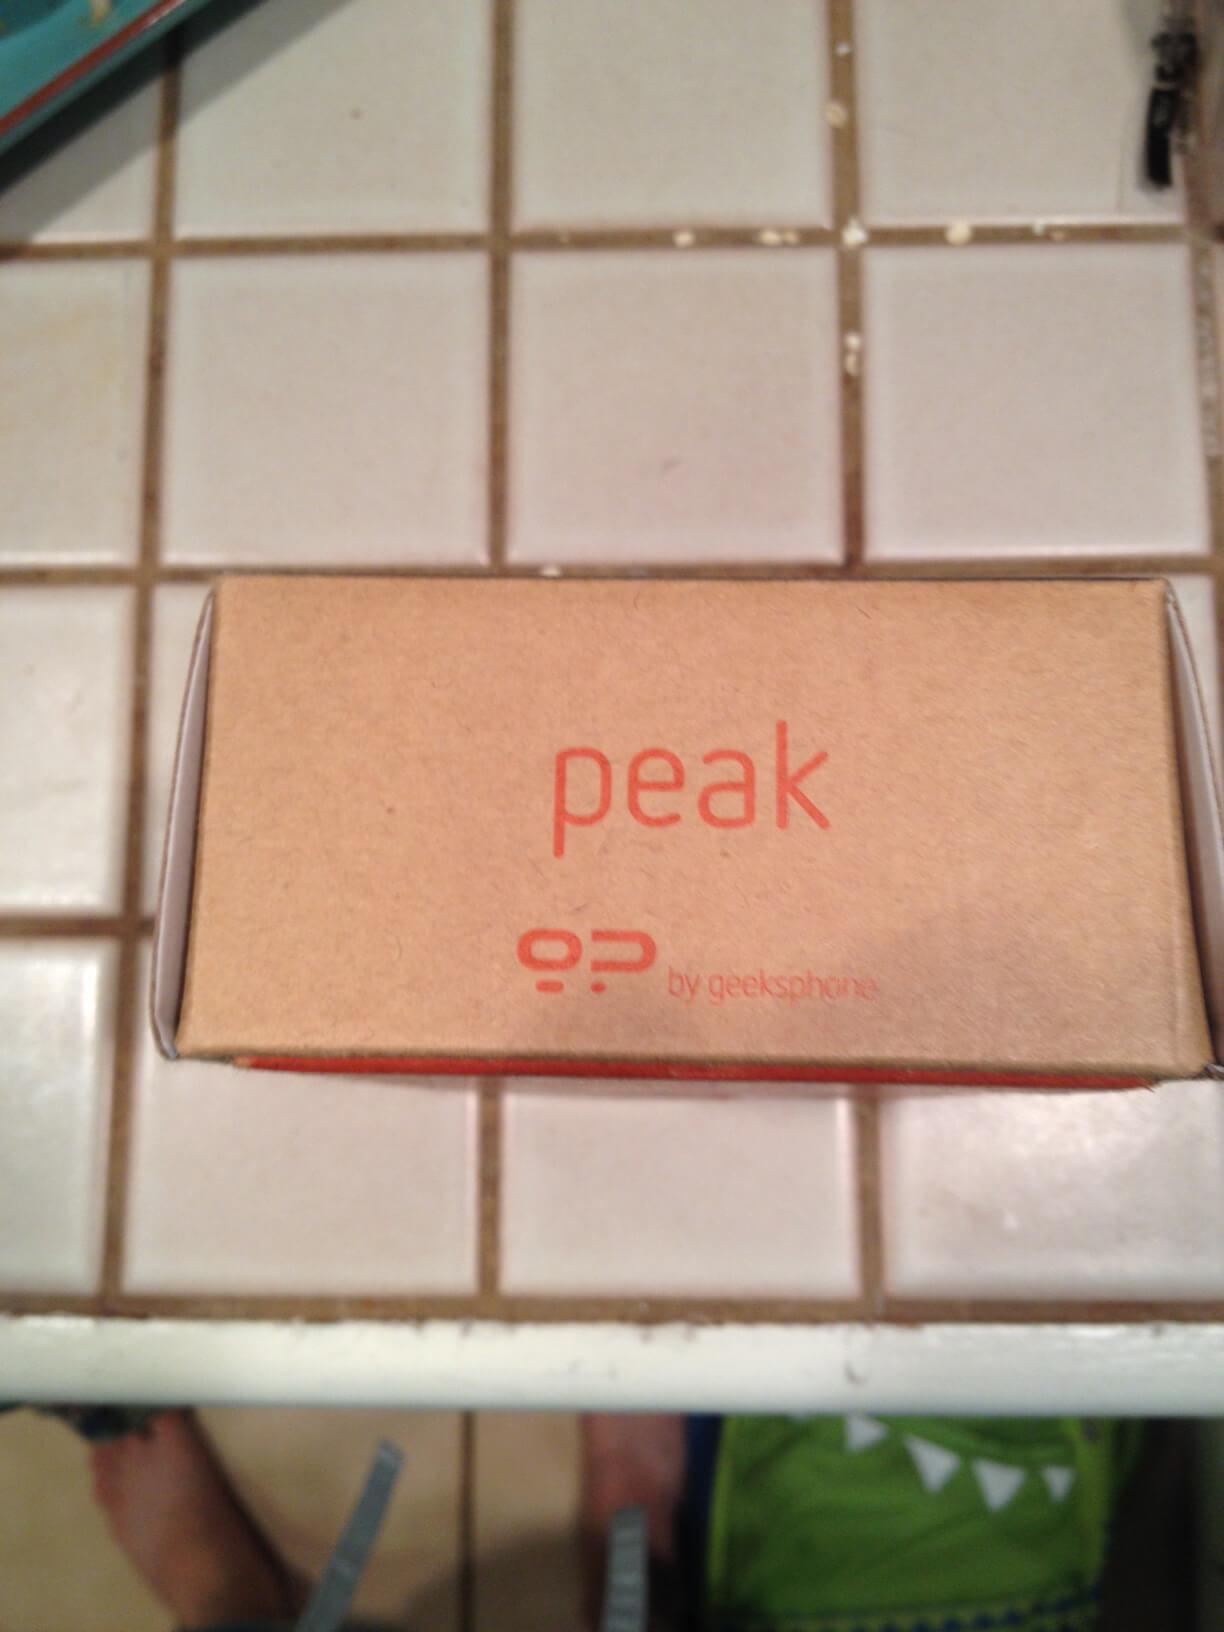 Geeksphone Peak Firefox OS Phone 2